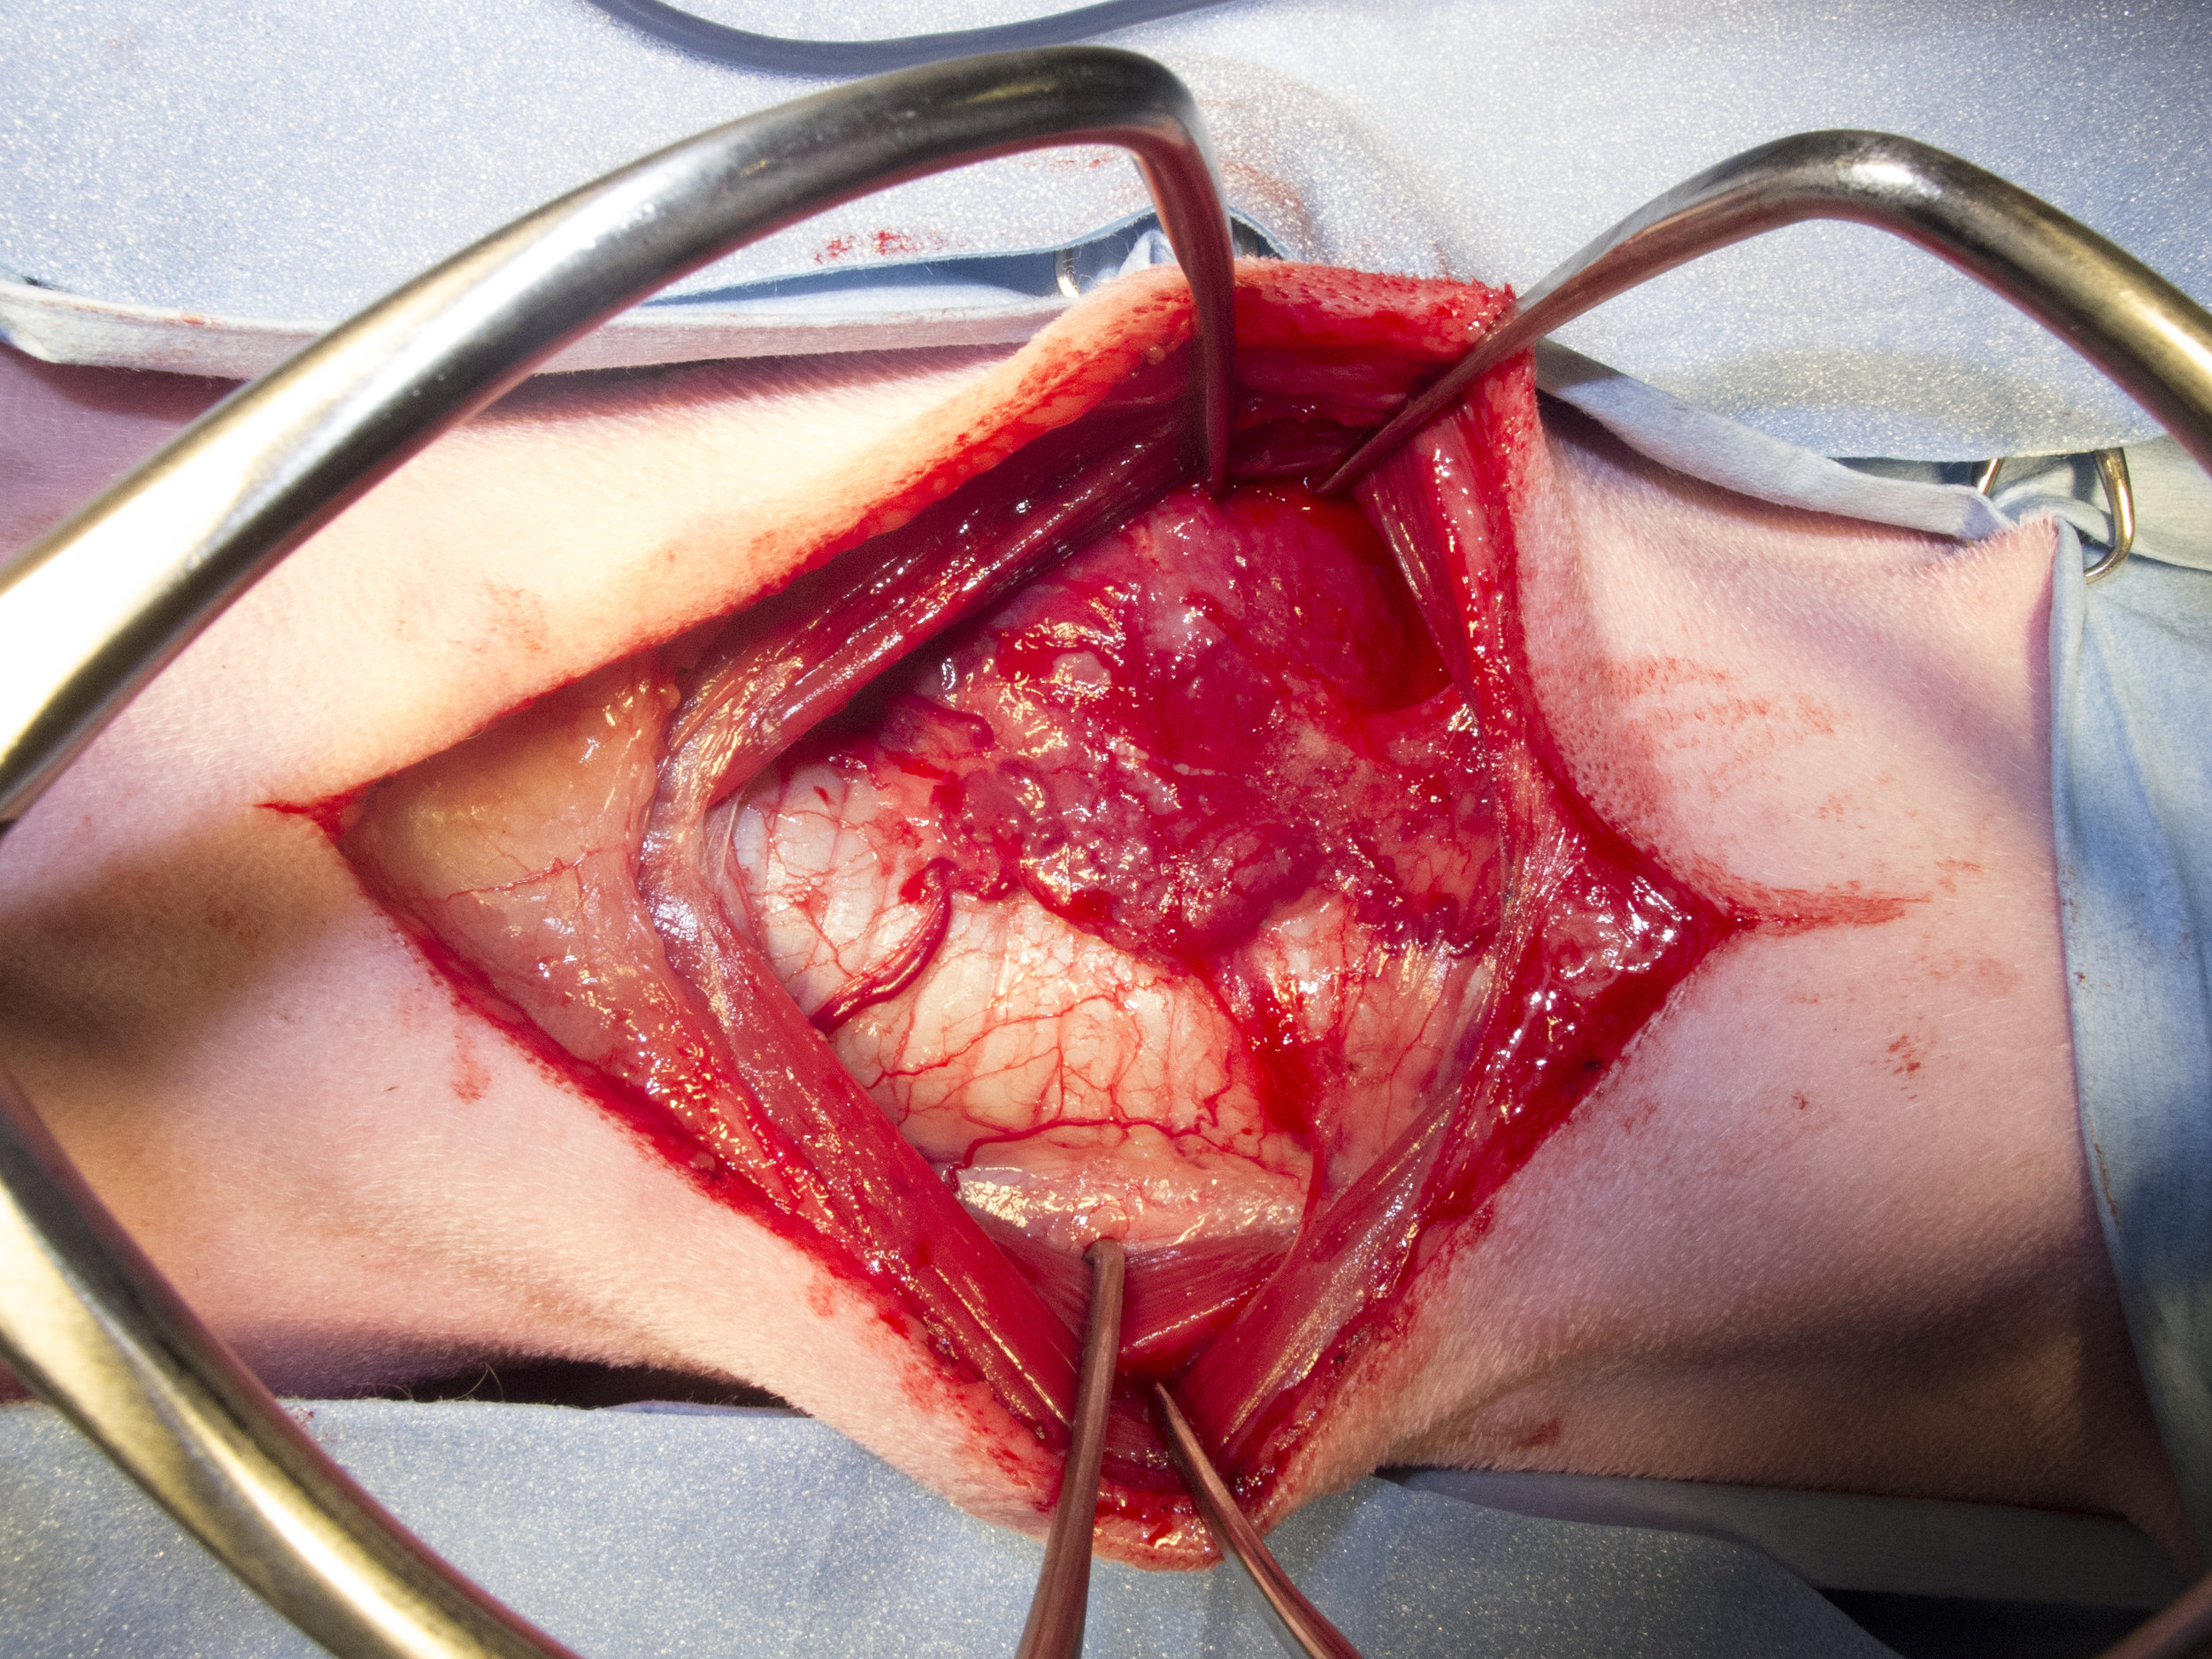 Vascular Carcinoma